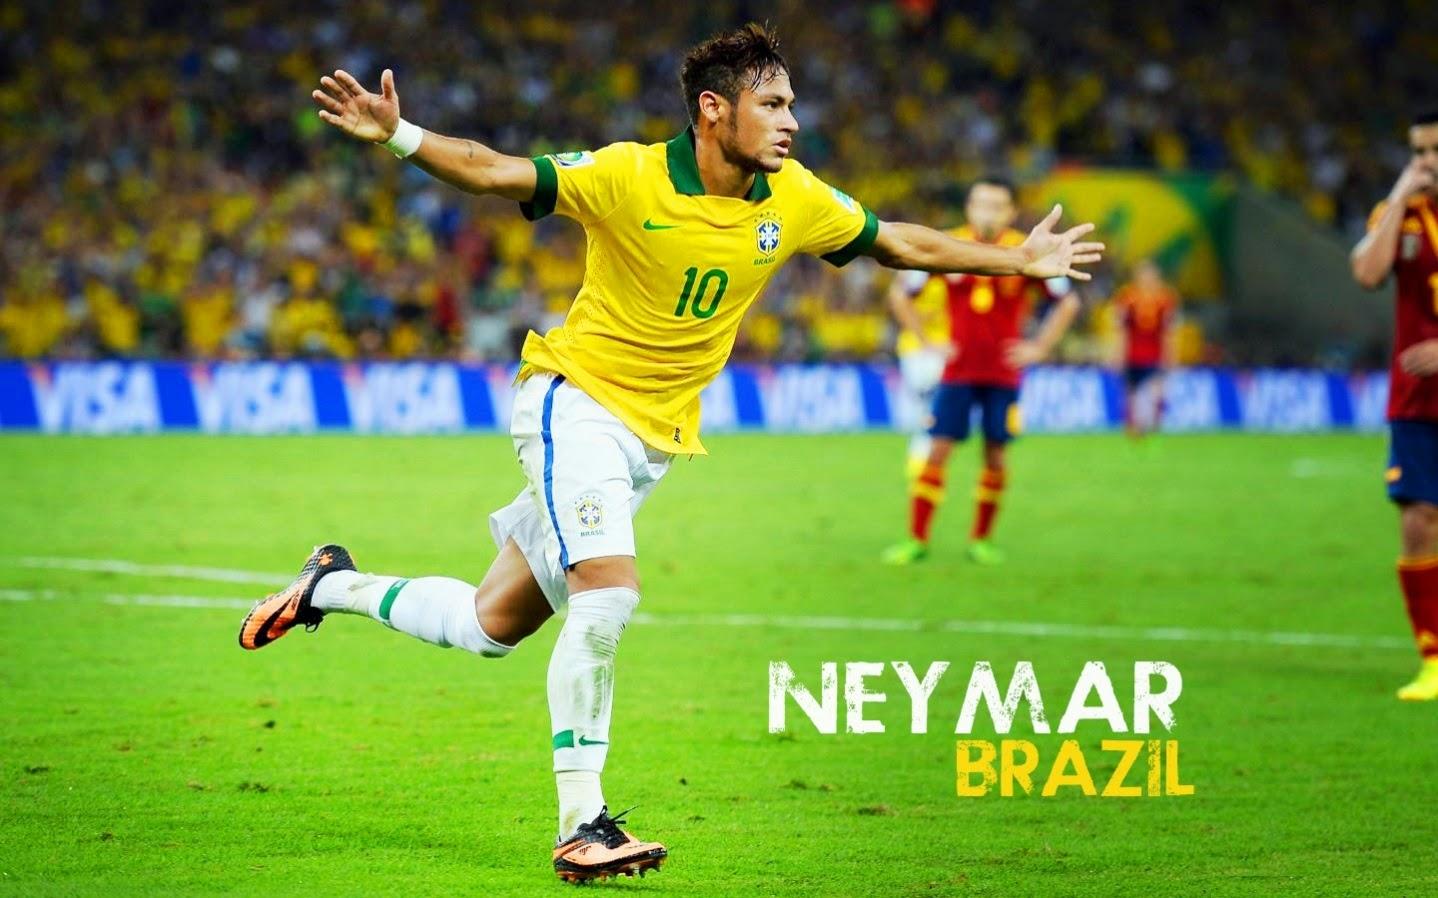 hd wallpapers neymar jr fifa world cup 2014 hd wallpapers 1438x898